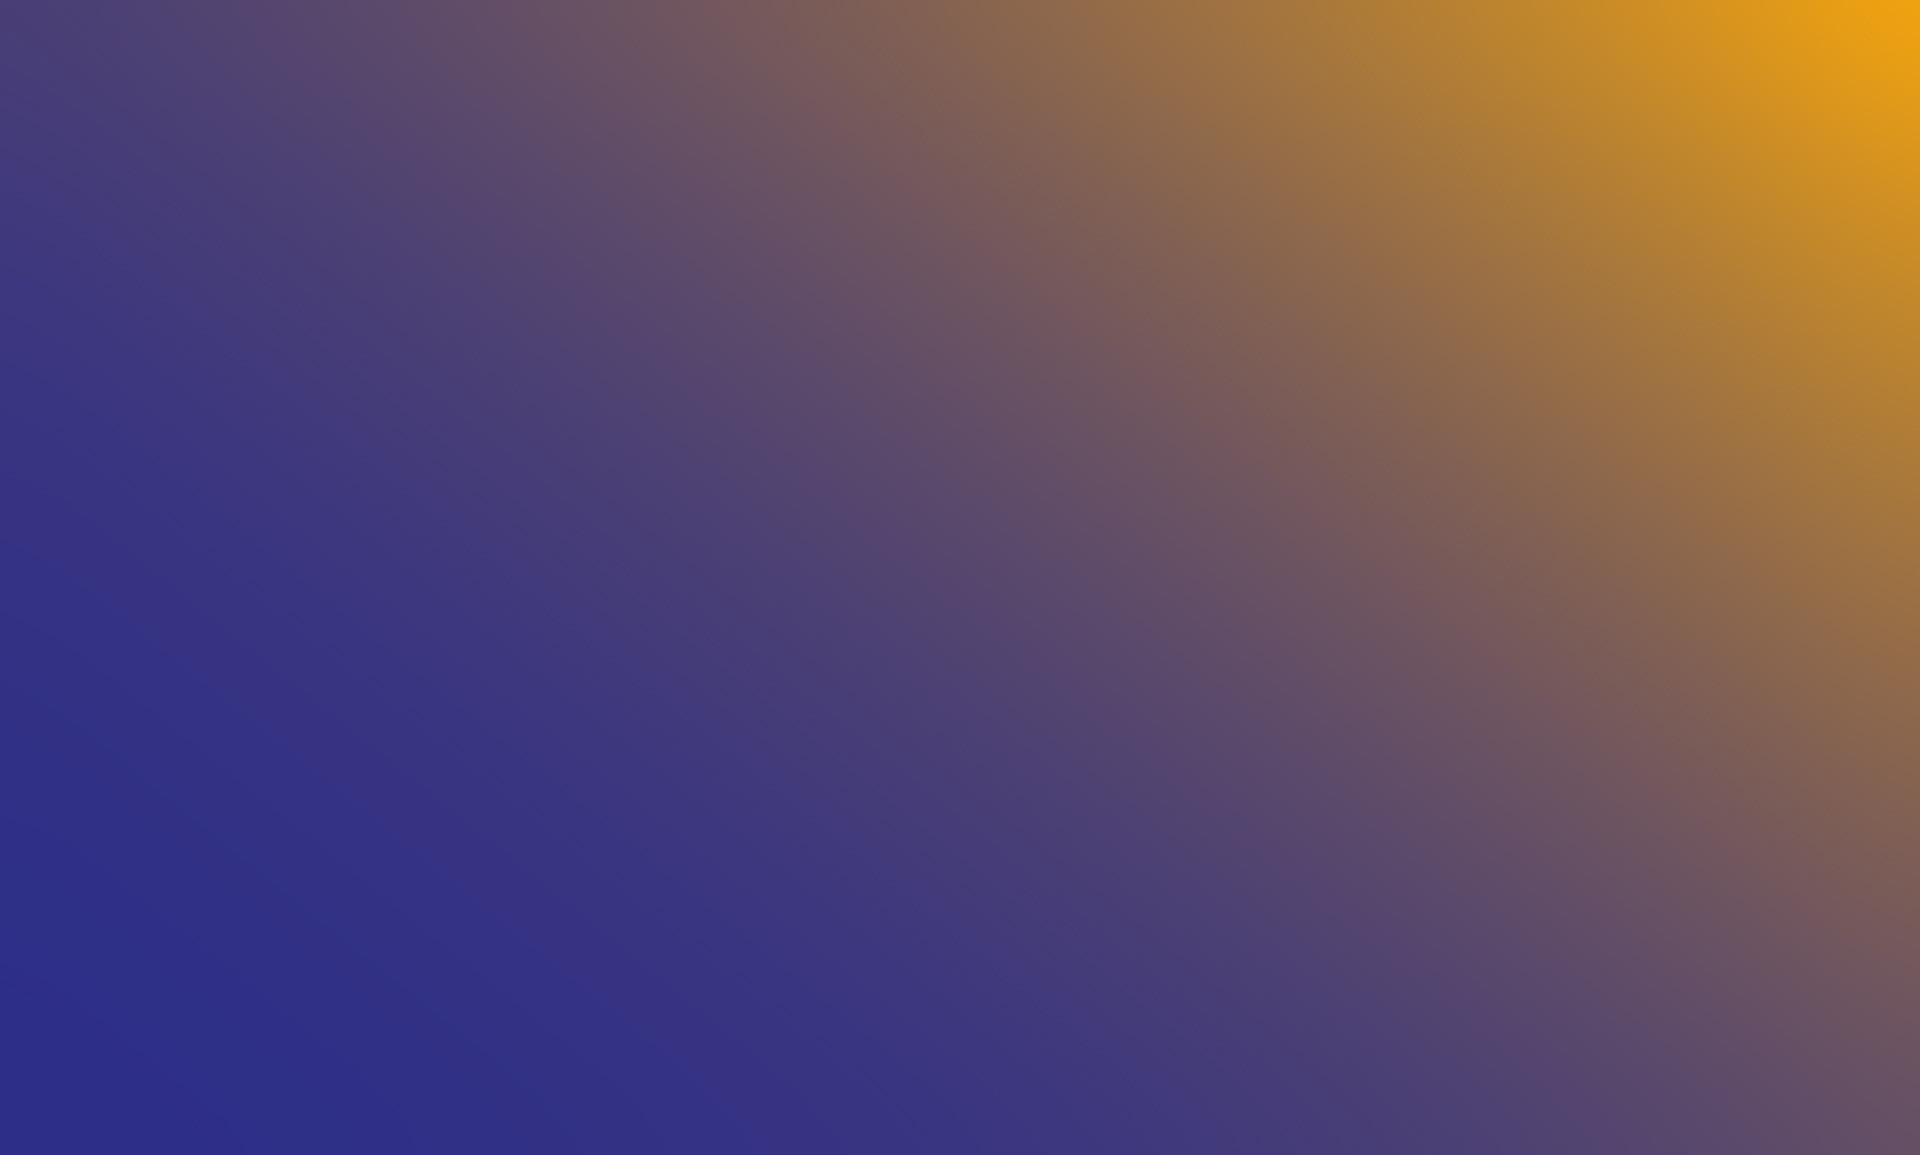 gradient_back.jpg